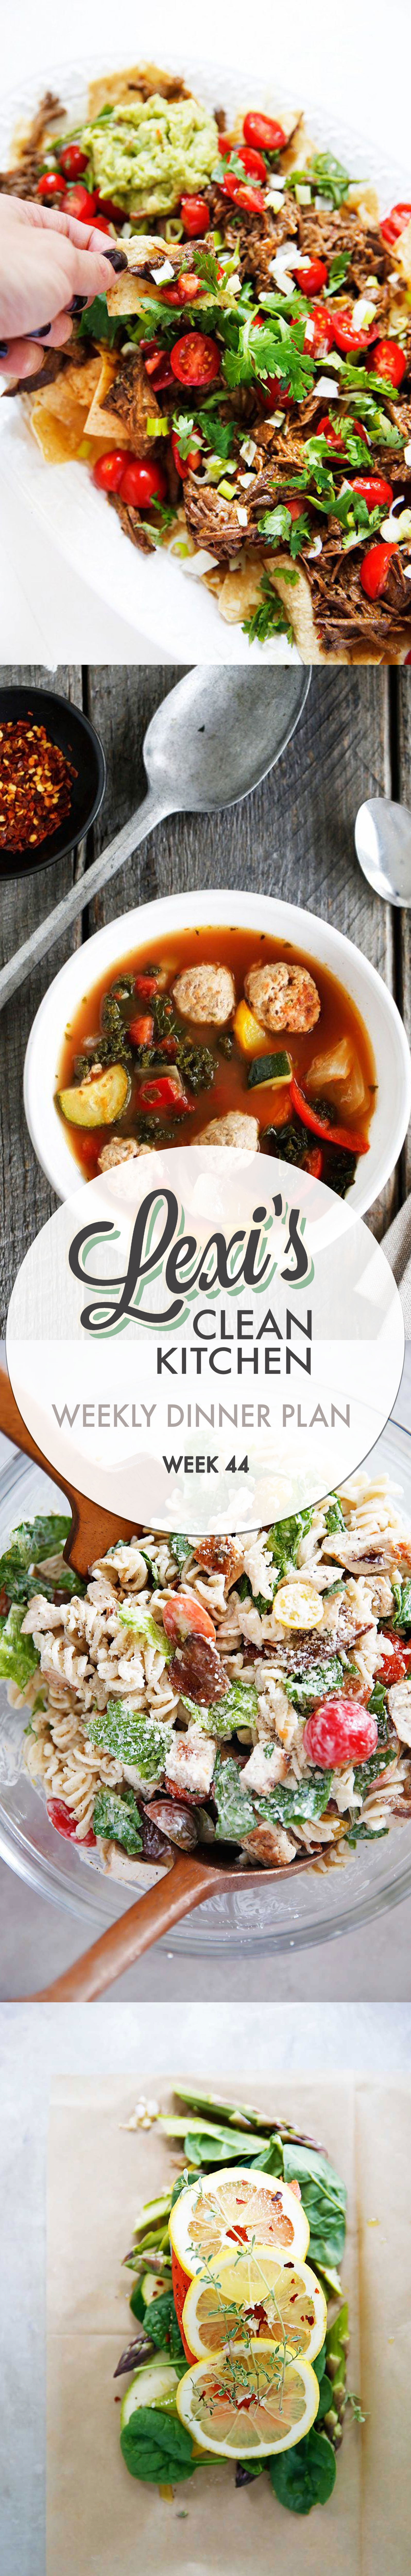 Weekly Dinner Plan Week 44 [paleo-friendly] | Lexi's Clean Kitchen